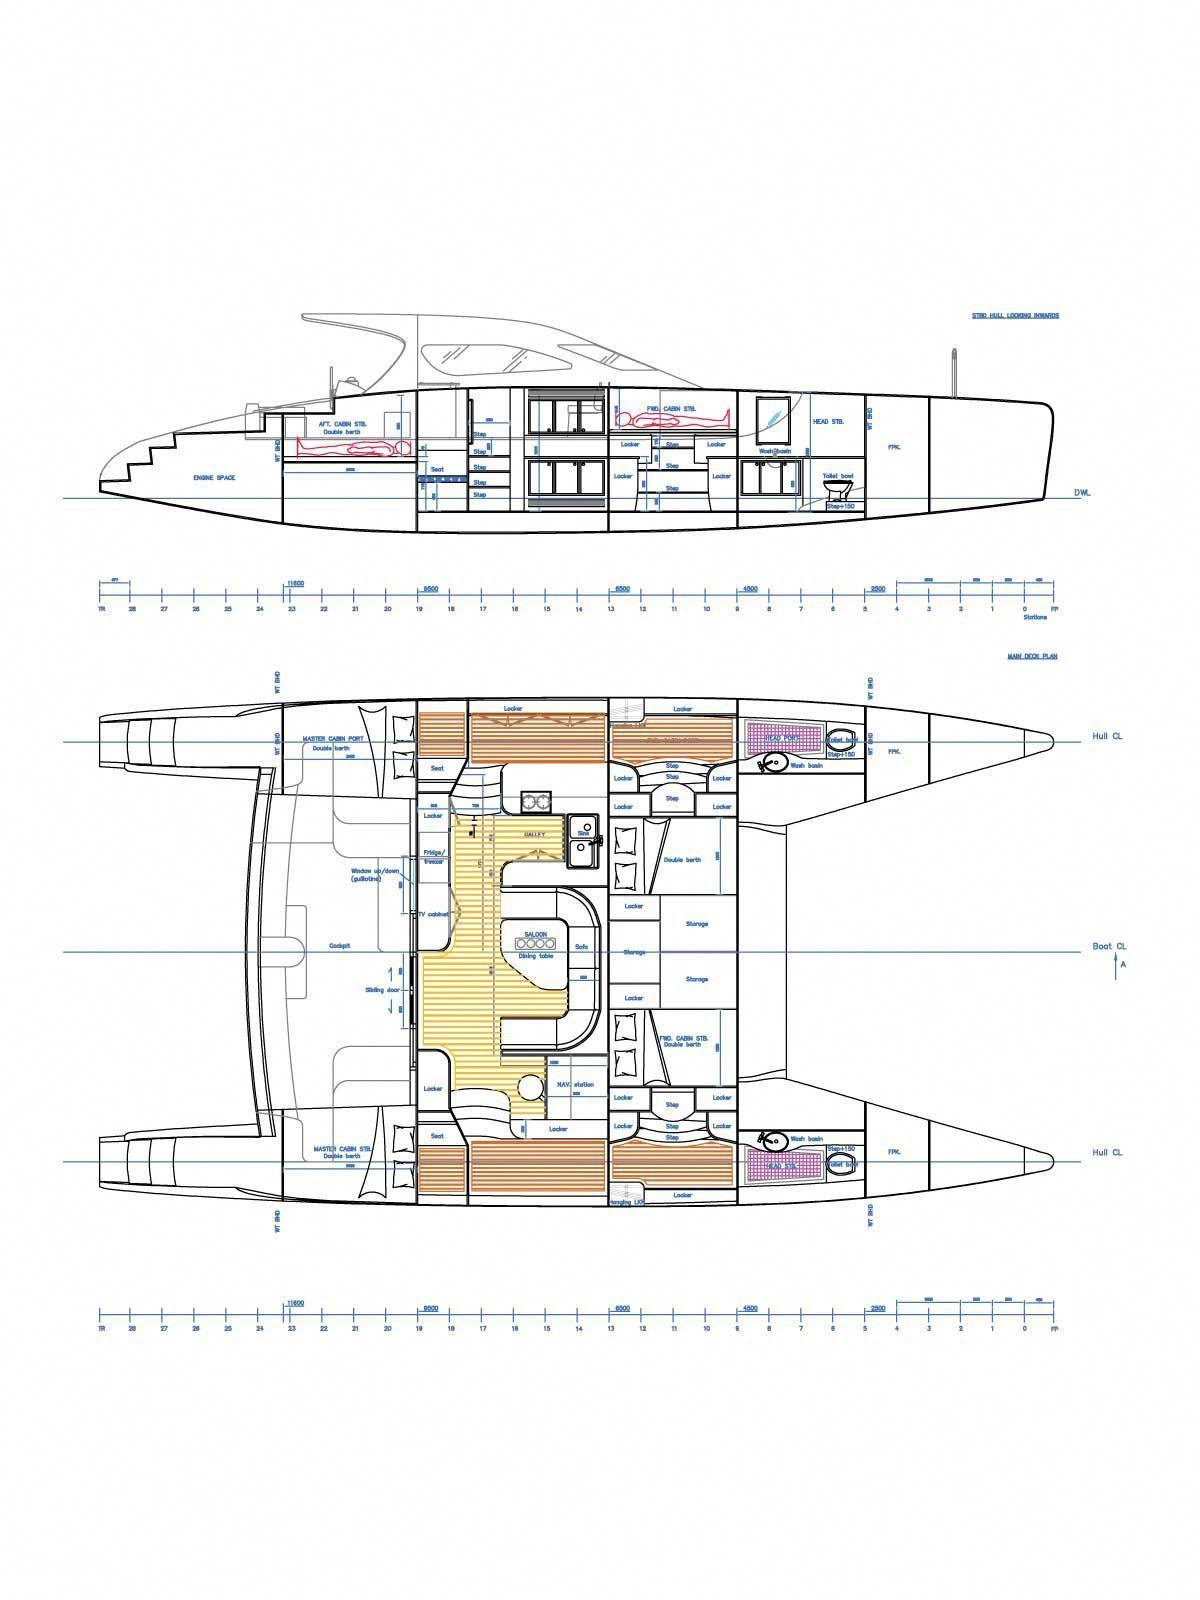 Maxum Boat Wiring Diagram Blog Sea Nymph Simple